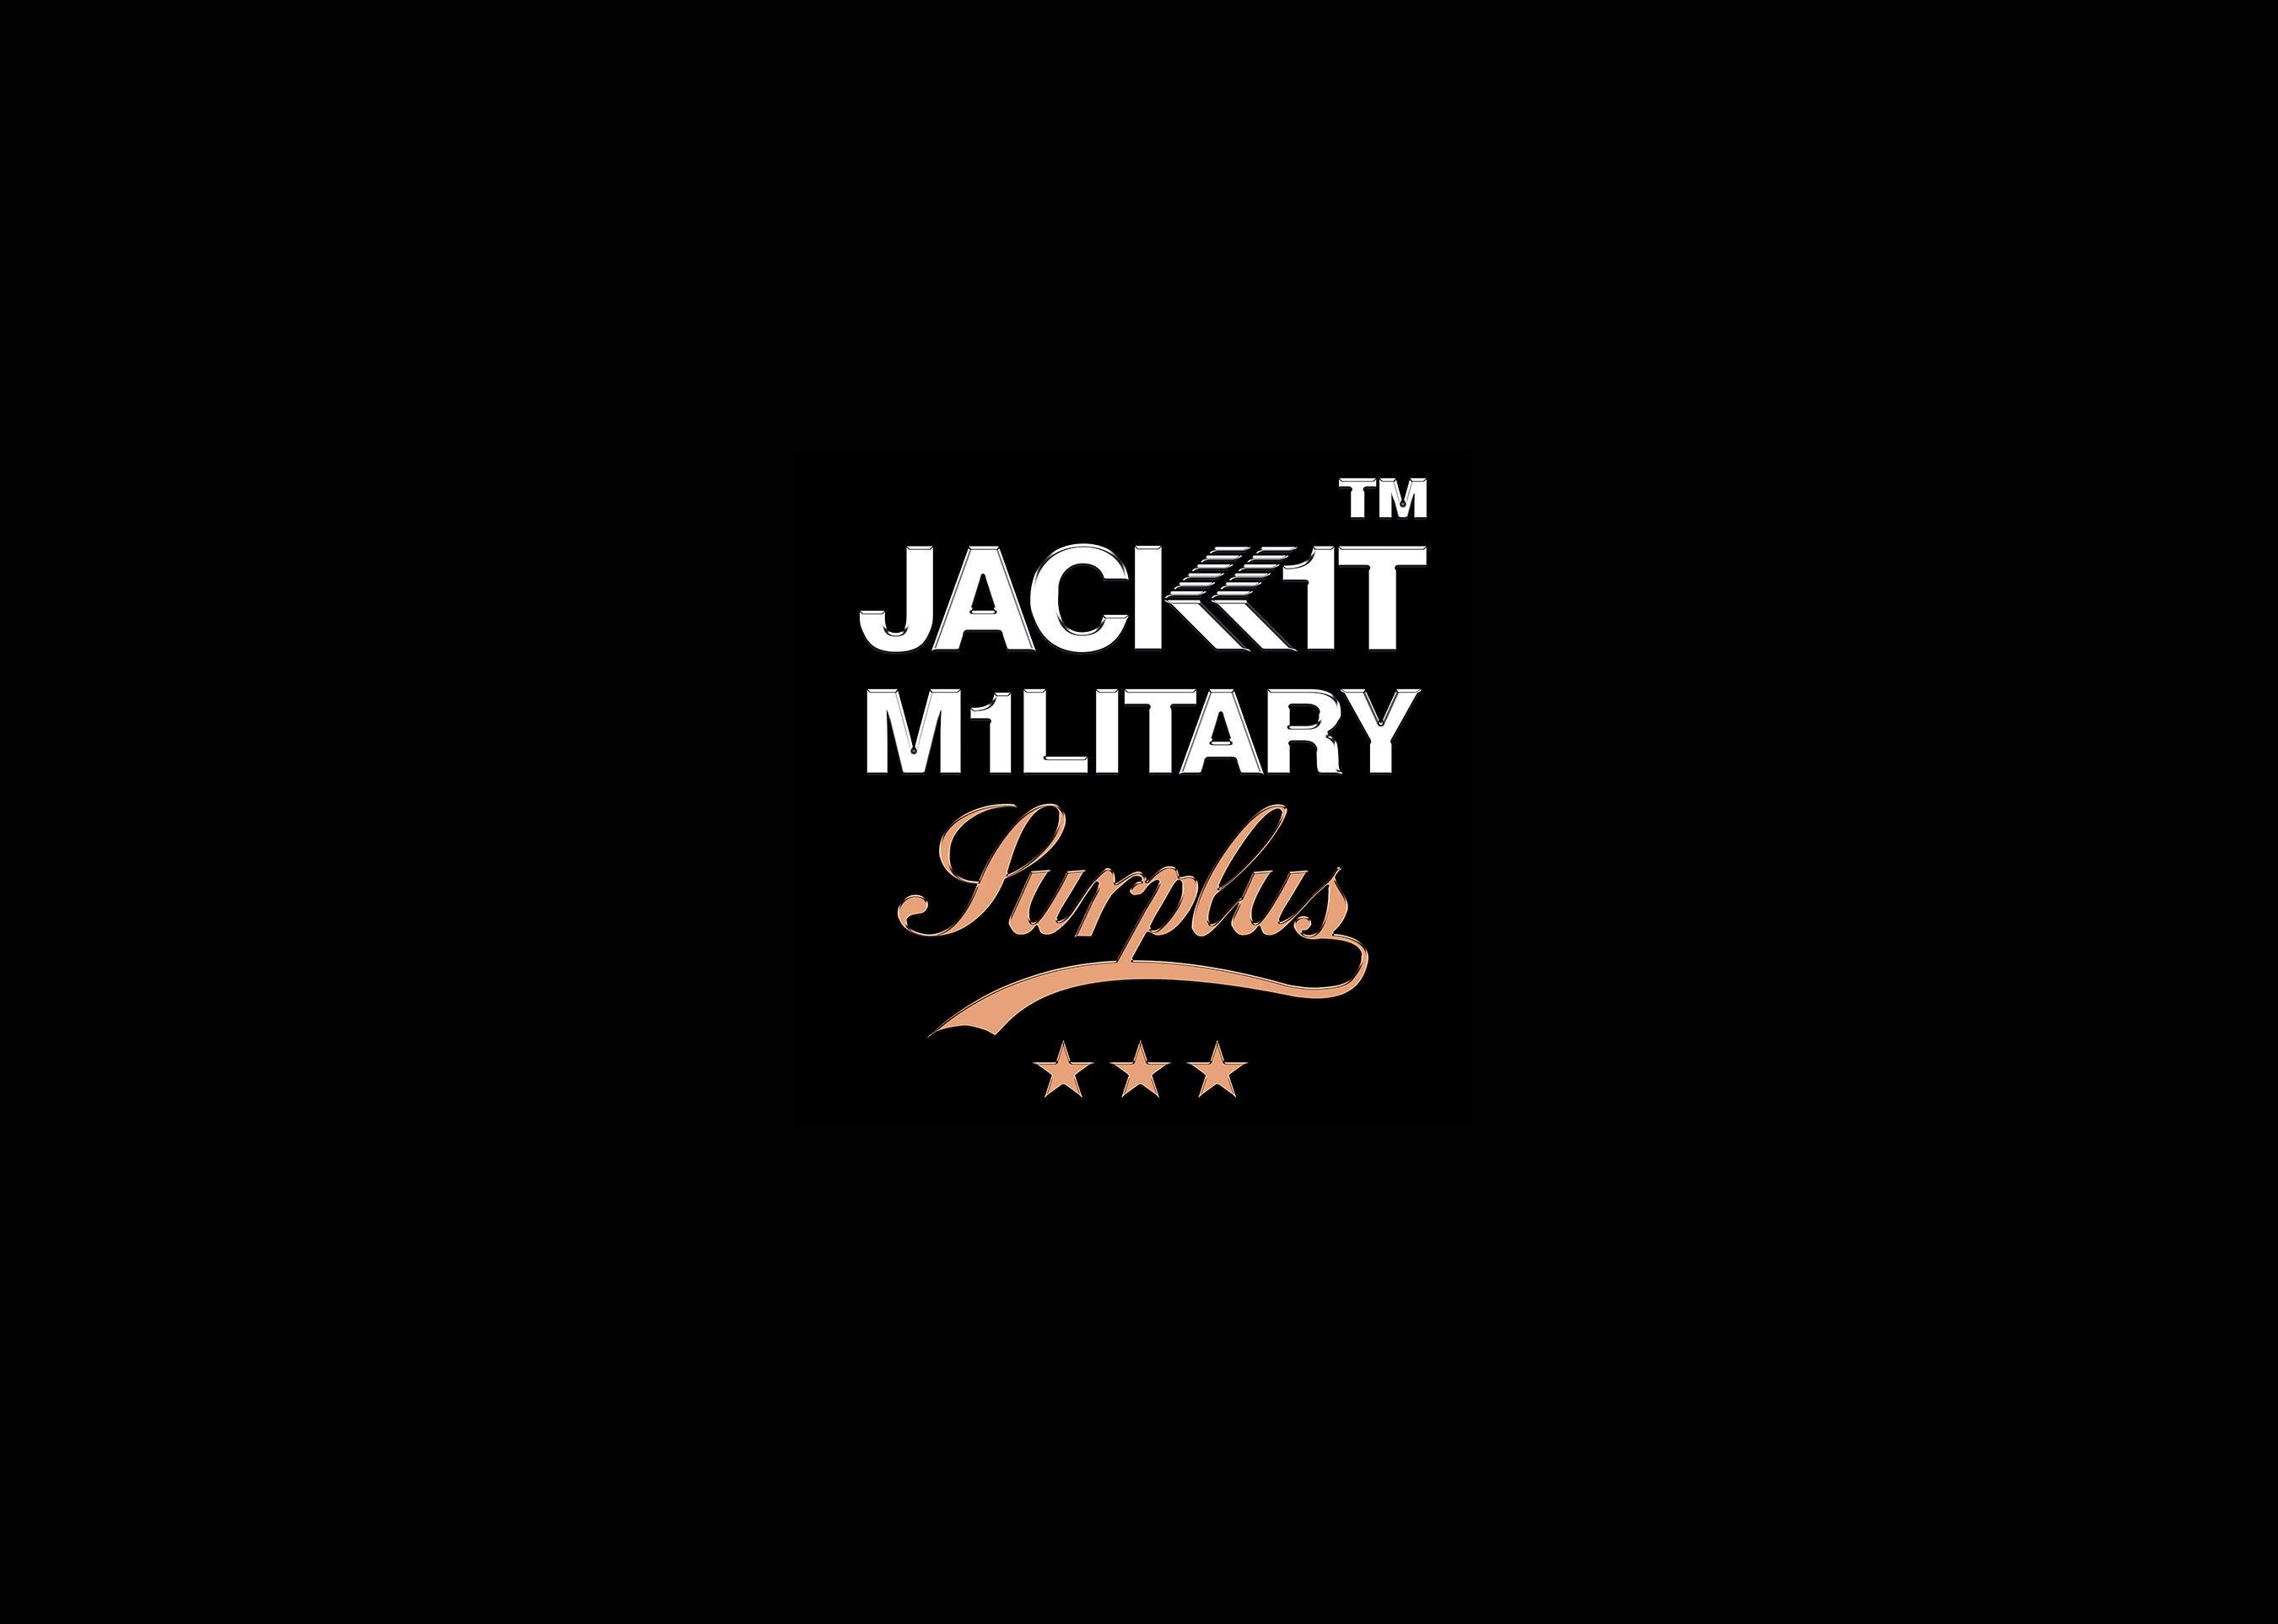 Jack1t™ Military (FEMME) TEMP